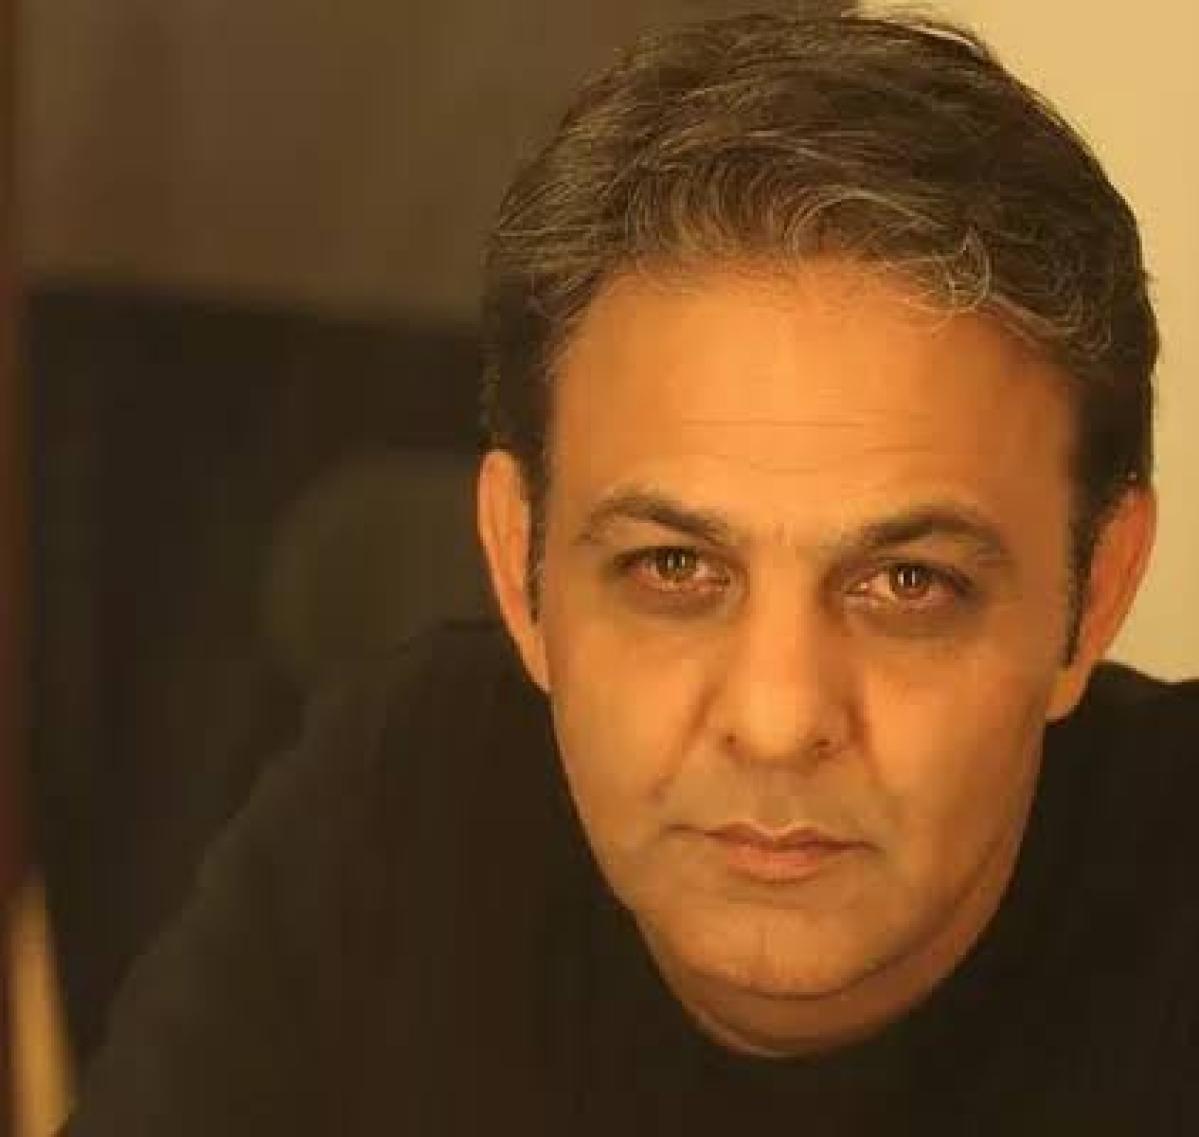 Veneet Raj Bagga – CCO and director of Onion Creative Media